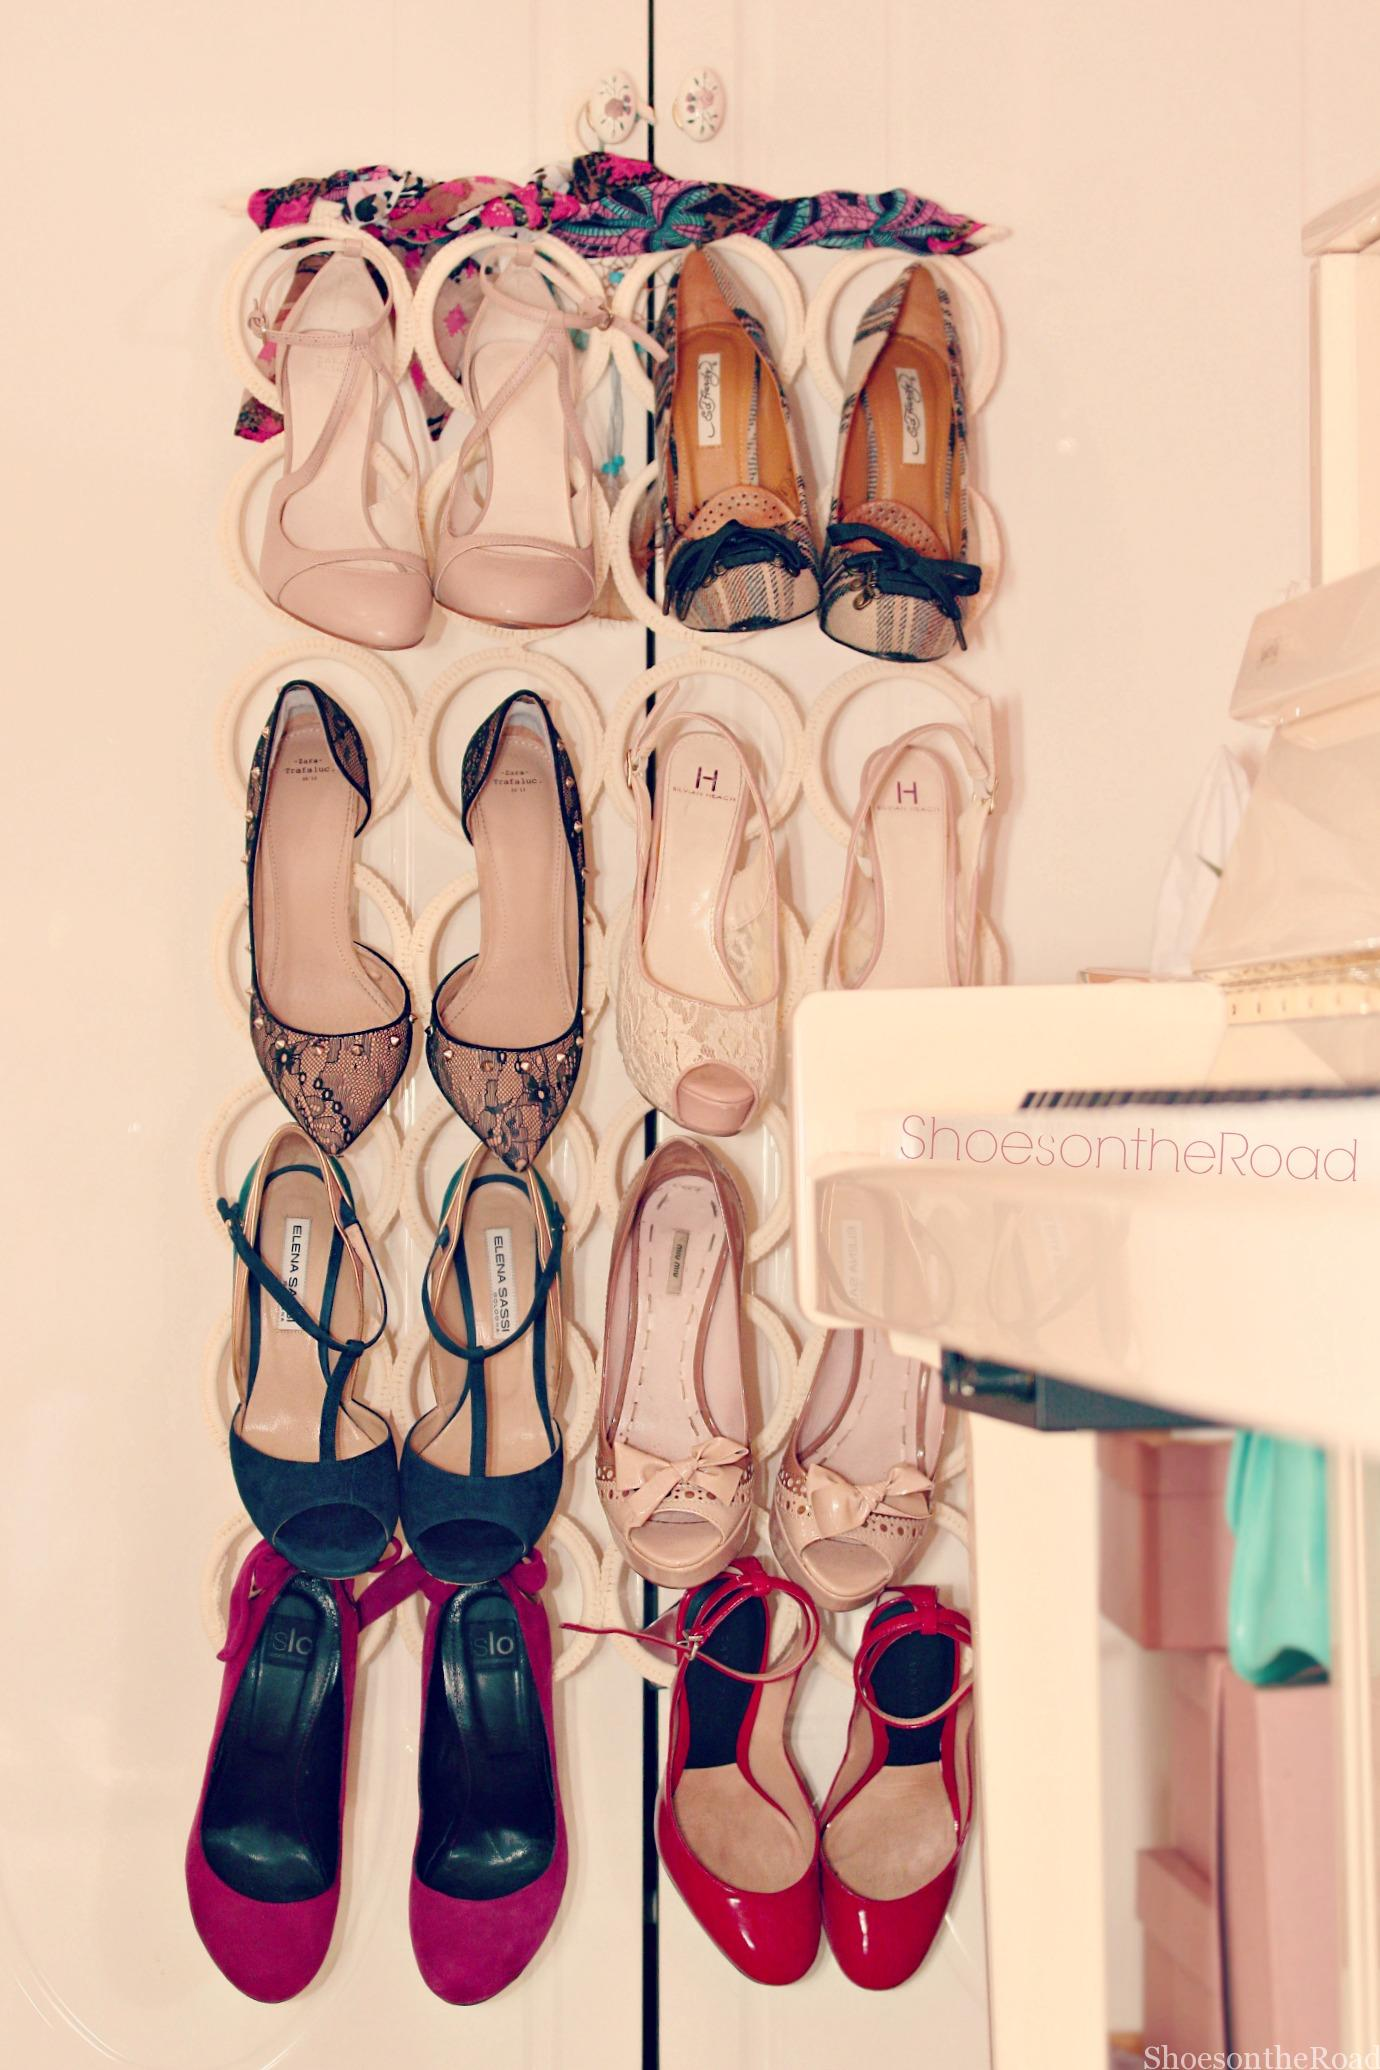 Shoerack_shoesontheroad_scarpiera_alternativa